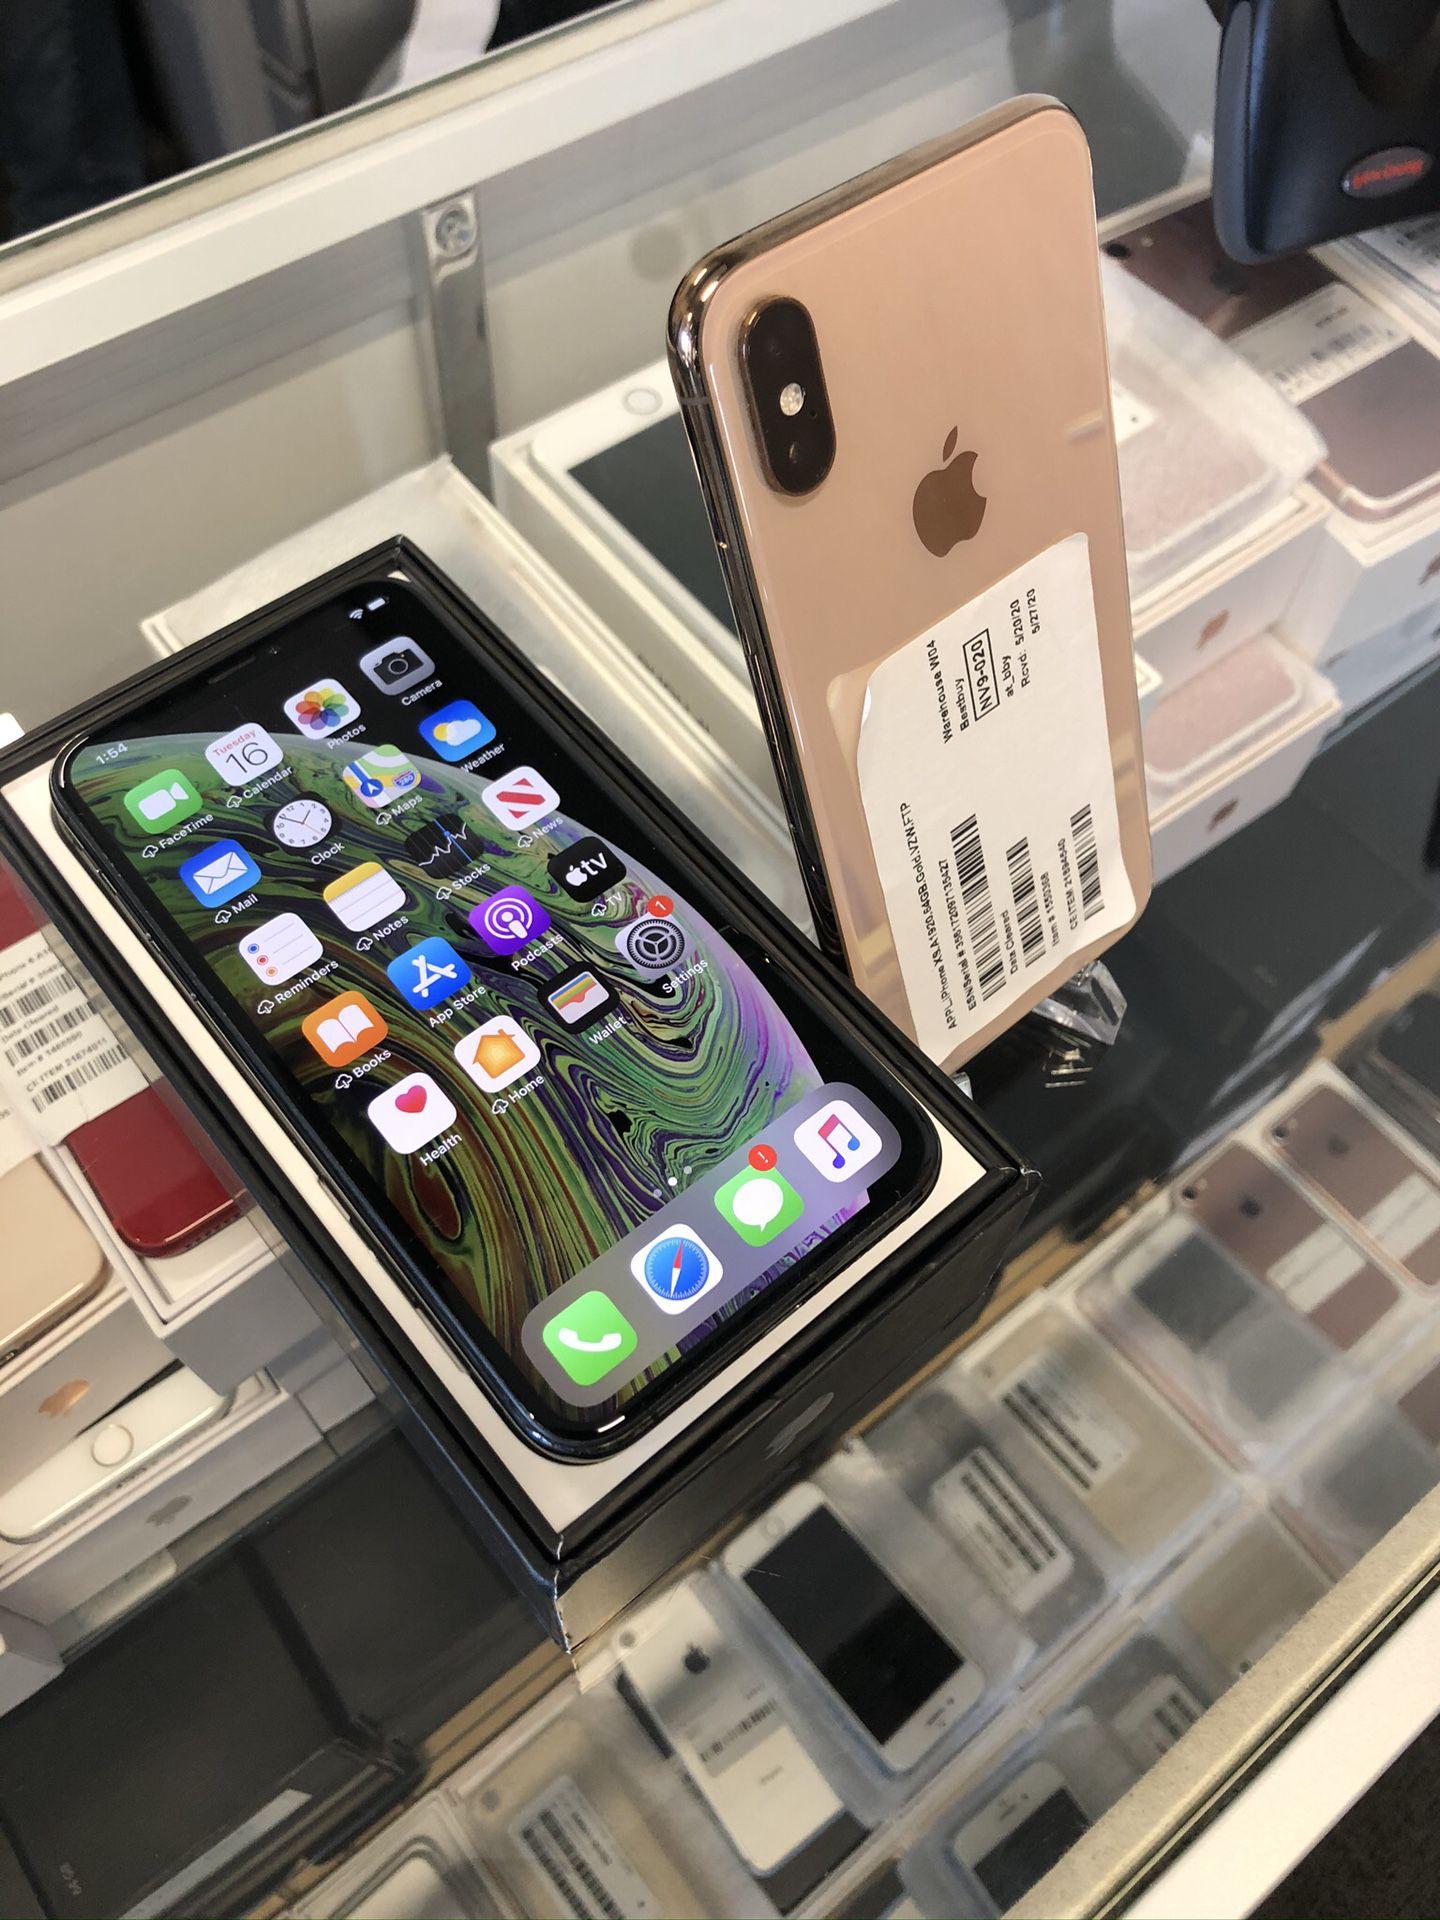 Apple iPhone XS 64GB unlocked $449-$569